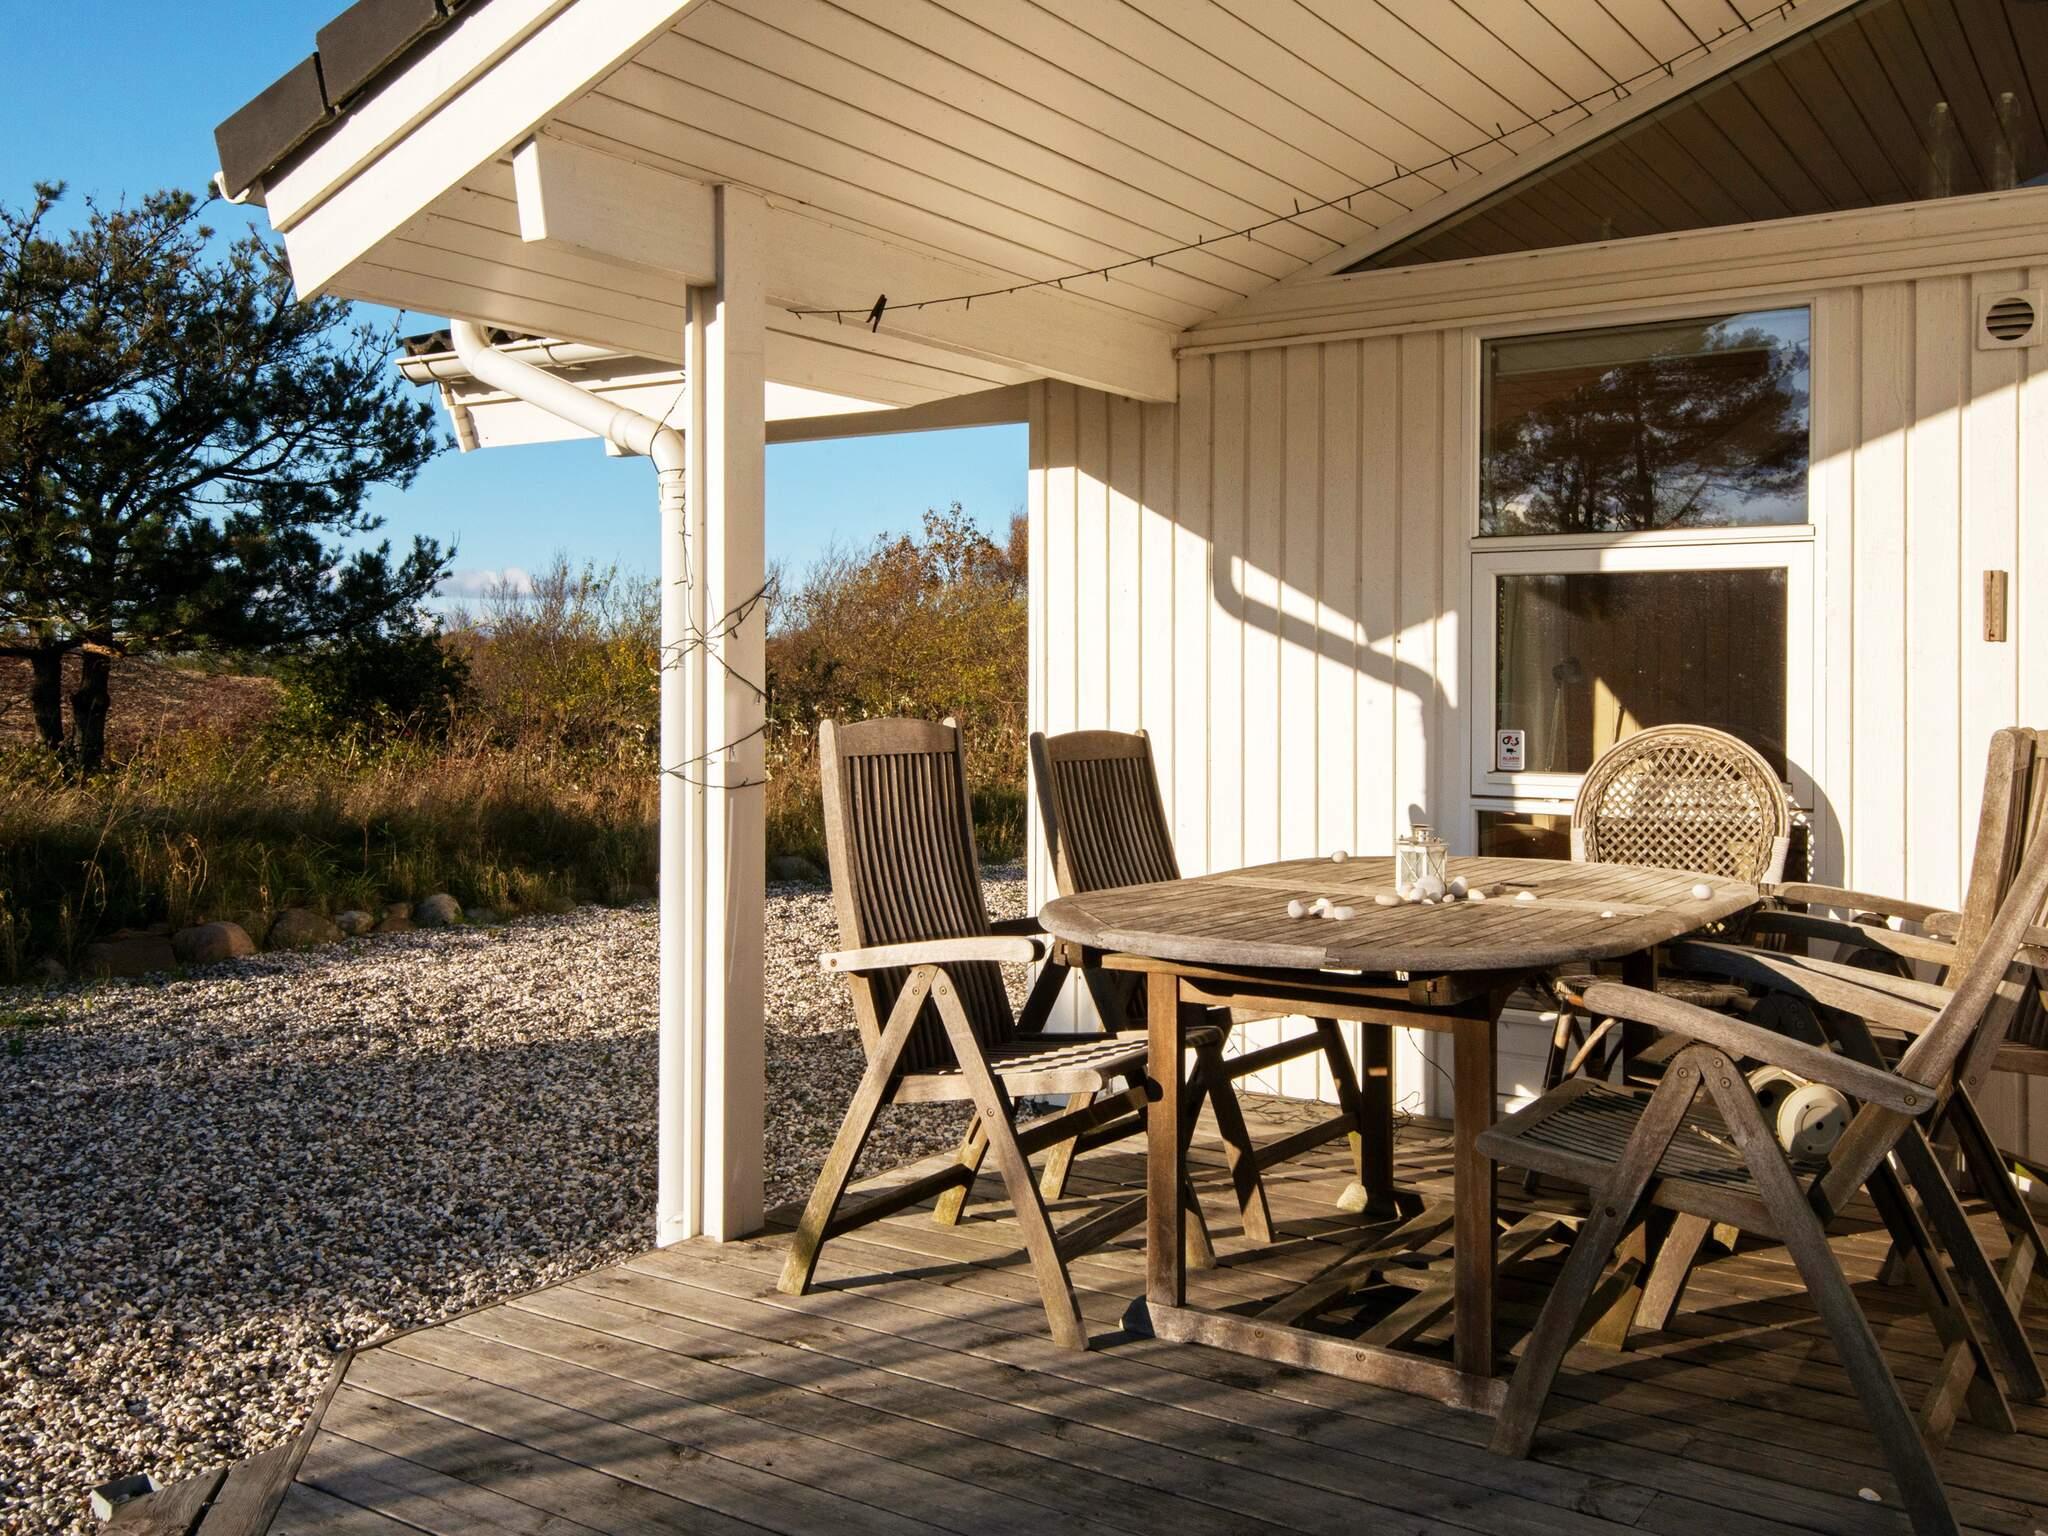 Maison de vacances Helgenæs (681779), Knebel, , Mer Baltique danoise, Danemark, image 16